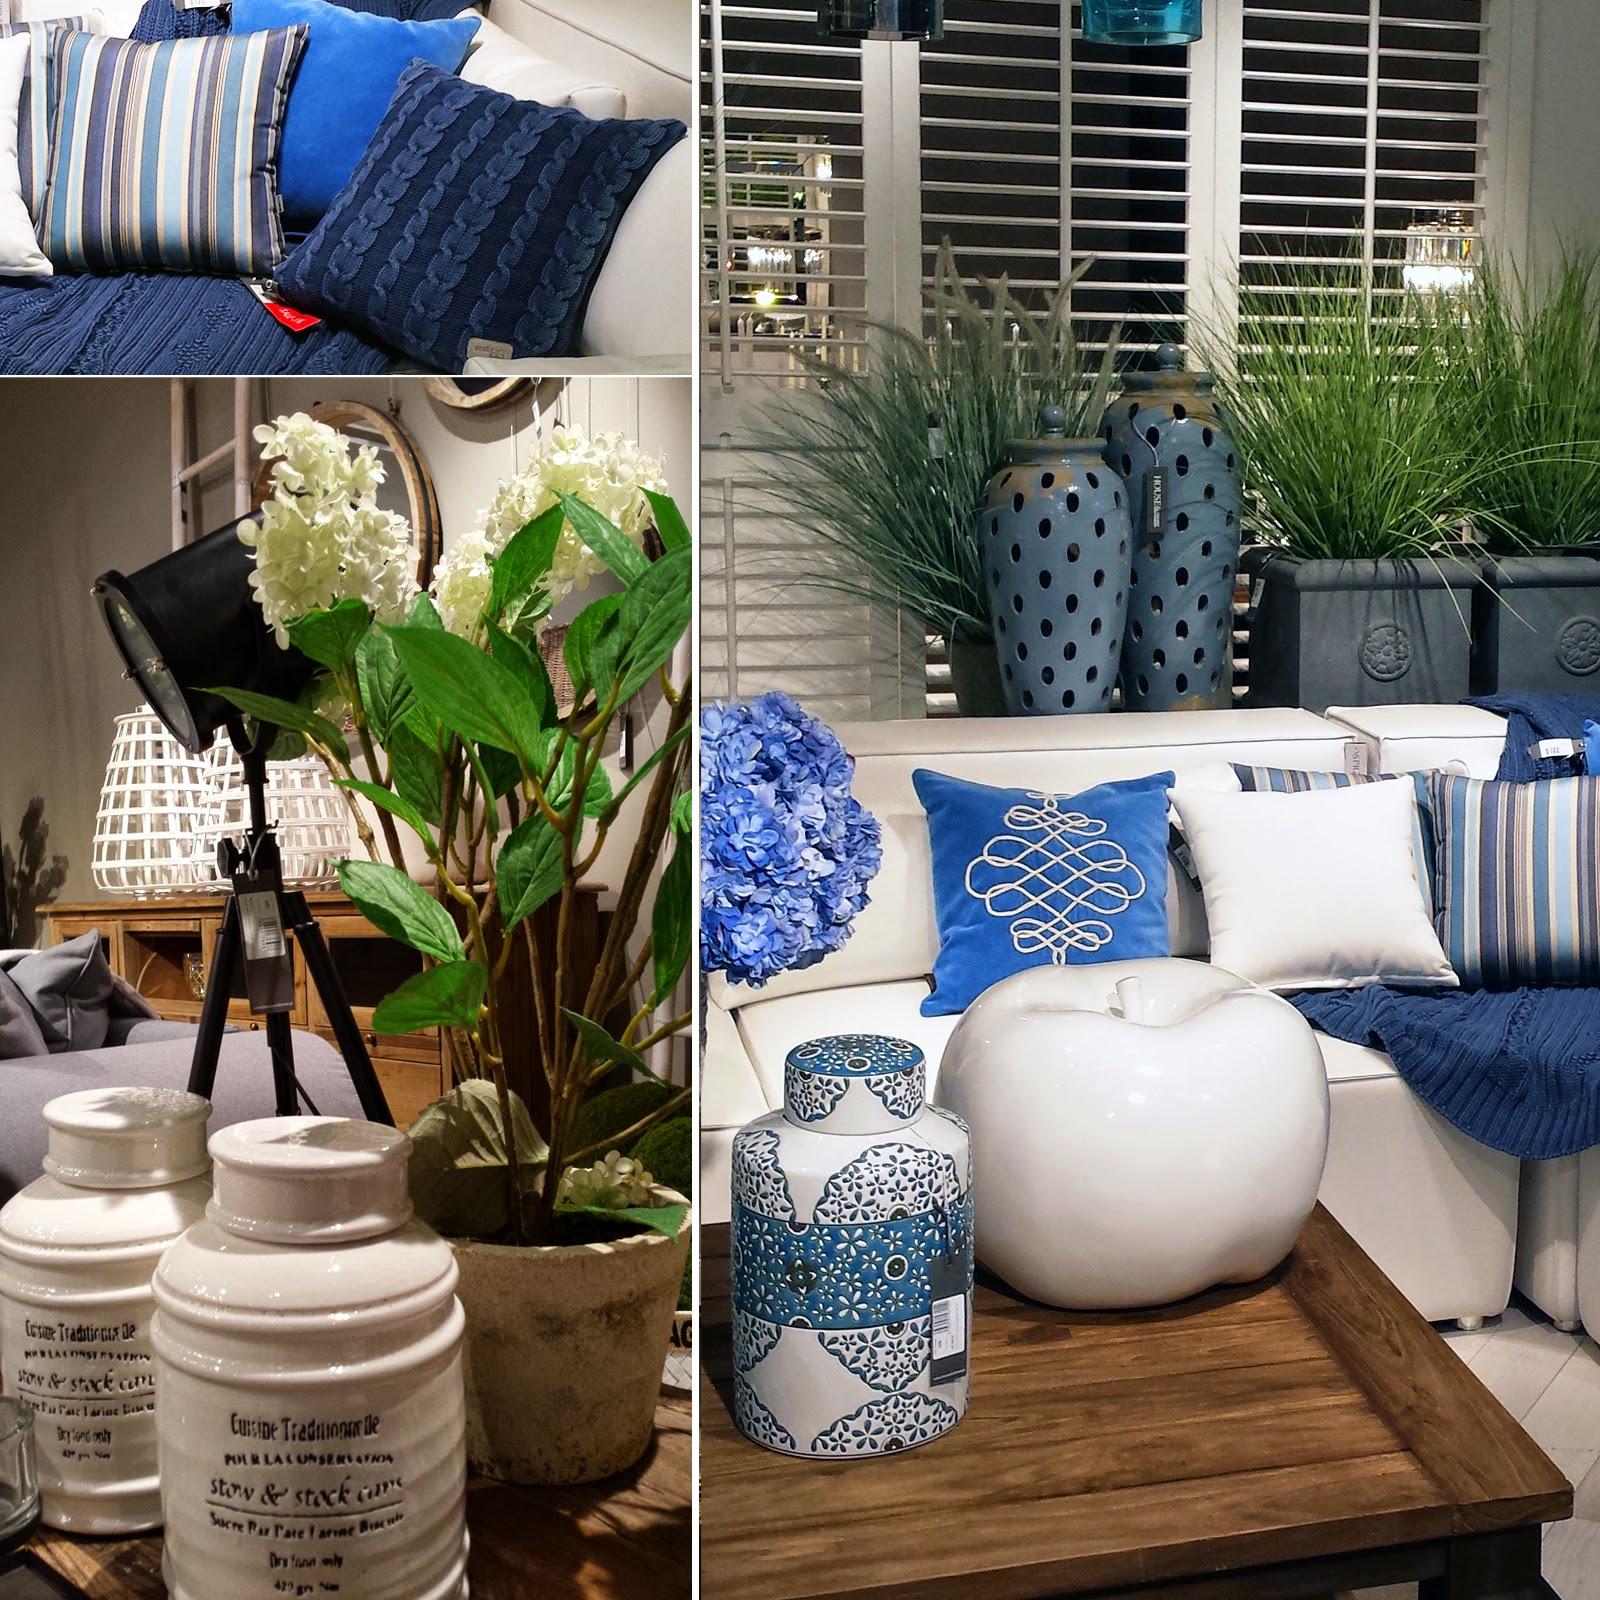 Dacon-Design-interiors-House&More-Miloo-Manutti-Eichholtz-Flamat-Pomax-Riviera Maison-Grand Design-meble skandynawskie-ogrodowe-niebieski